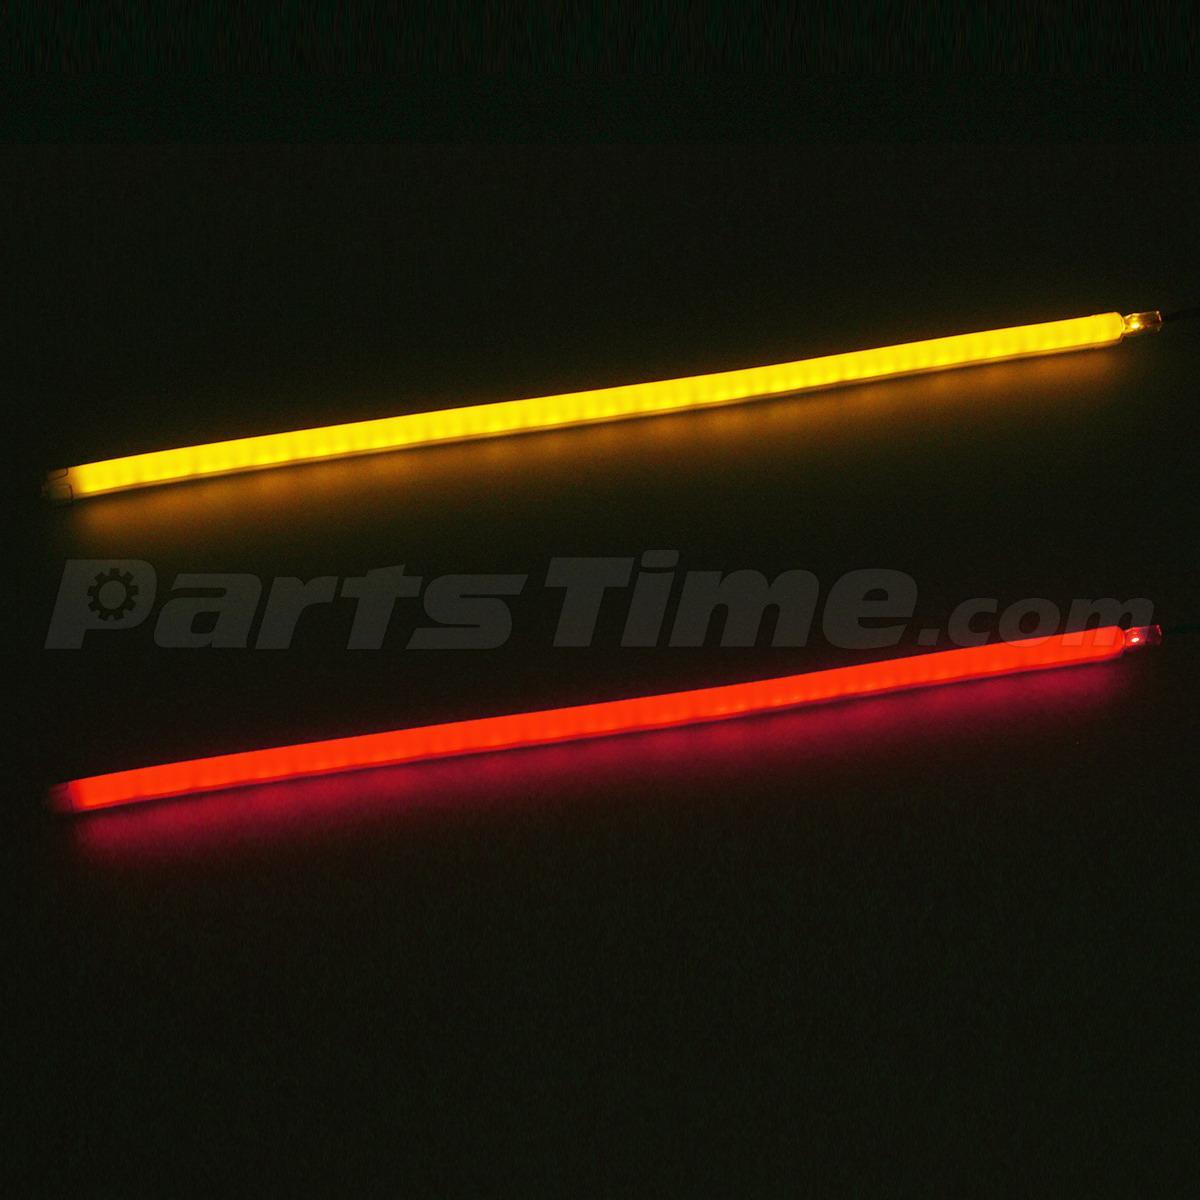 car shine 324 3528 led neon strips bar kit 60 truck tailgate red led. Black Bedroom Furniture Sets. Home Design Ideas